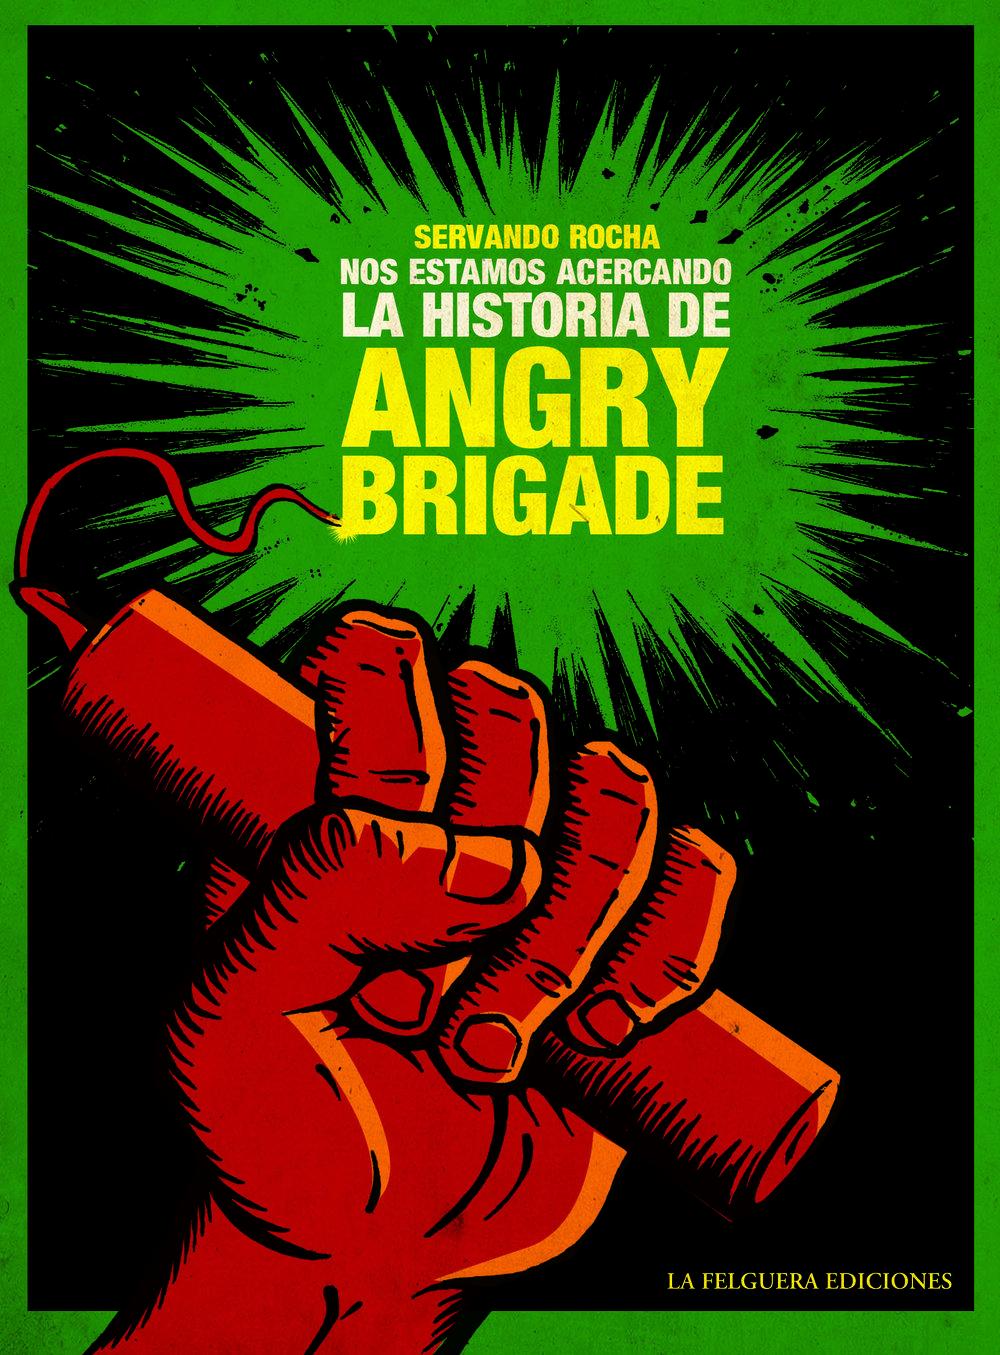 Portada-para-medios-Angry-Brigade-book2.jpg